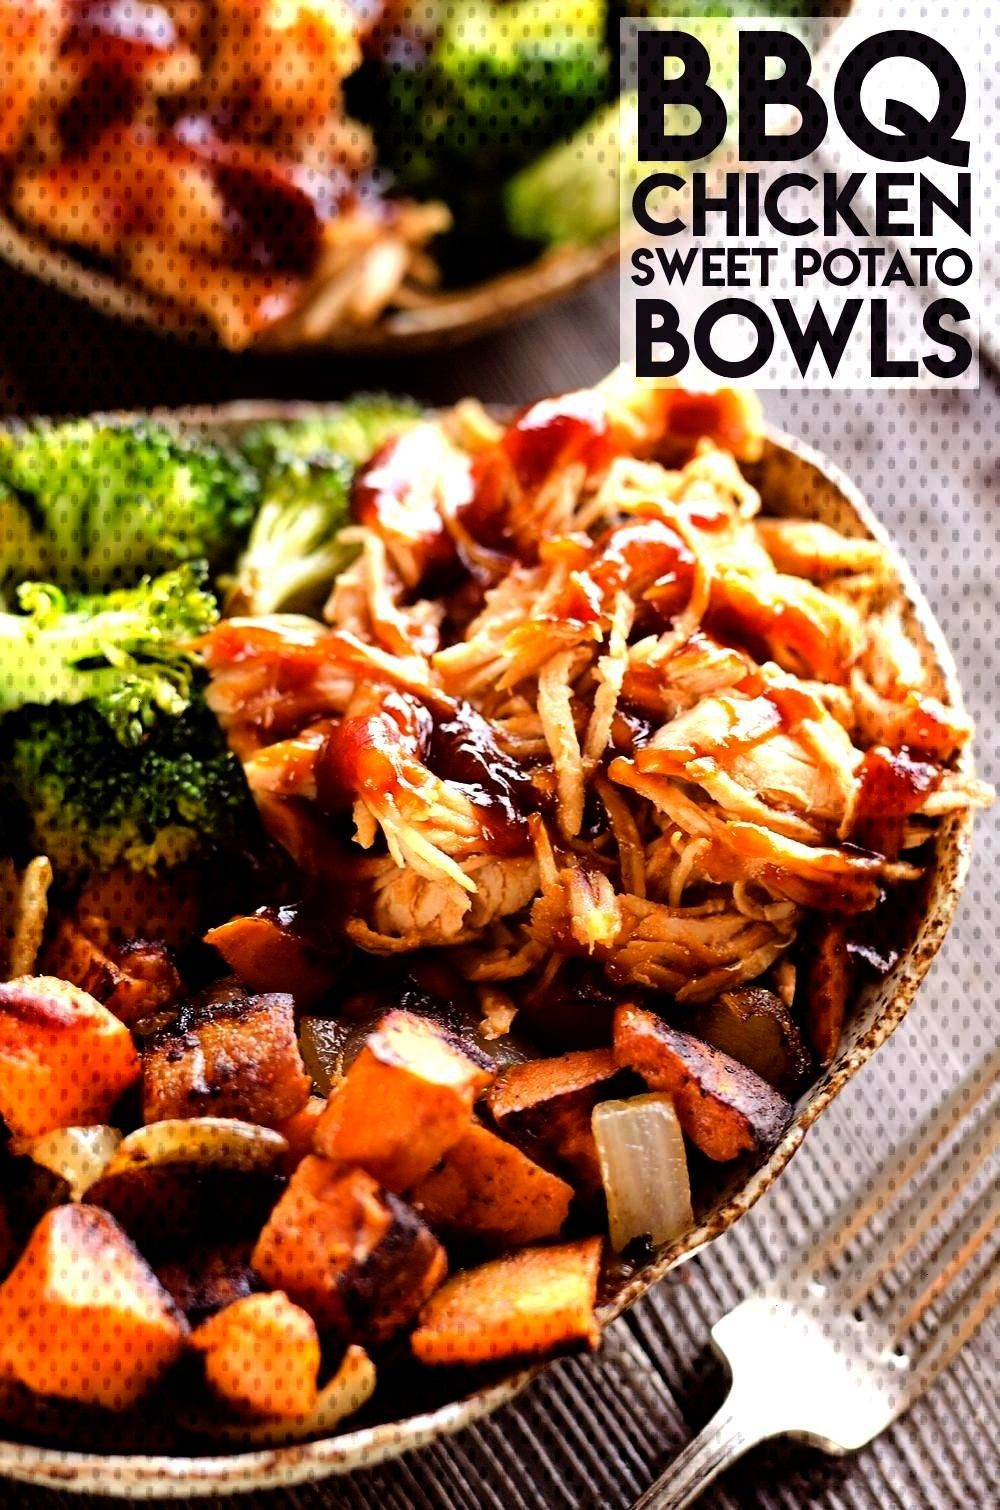 Chicken amp Roasted Sweet Potato Bowls BBQ Chicken amp Roasted Sweet Potato Bowls are a hearty andBBQ